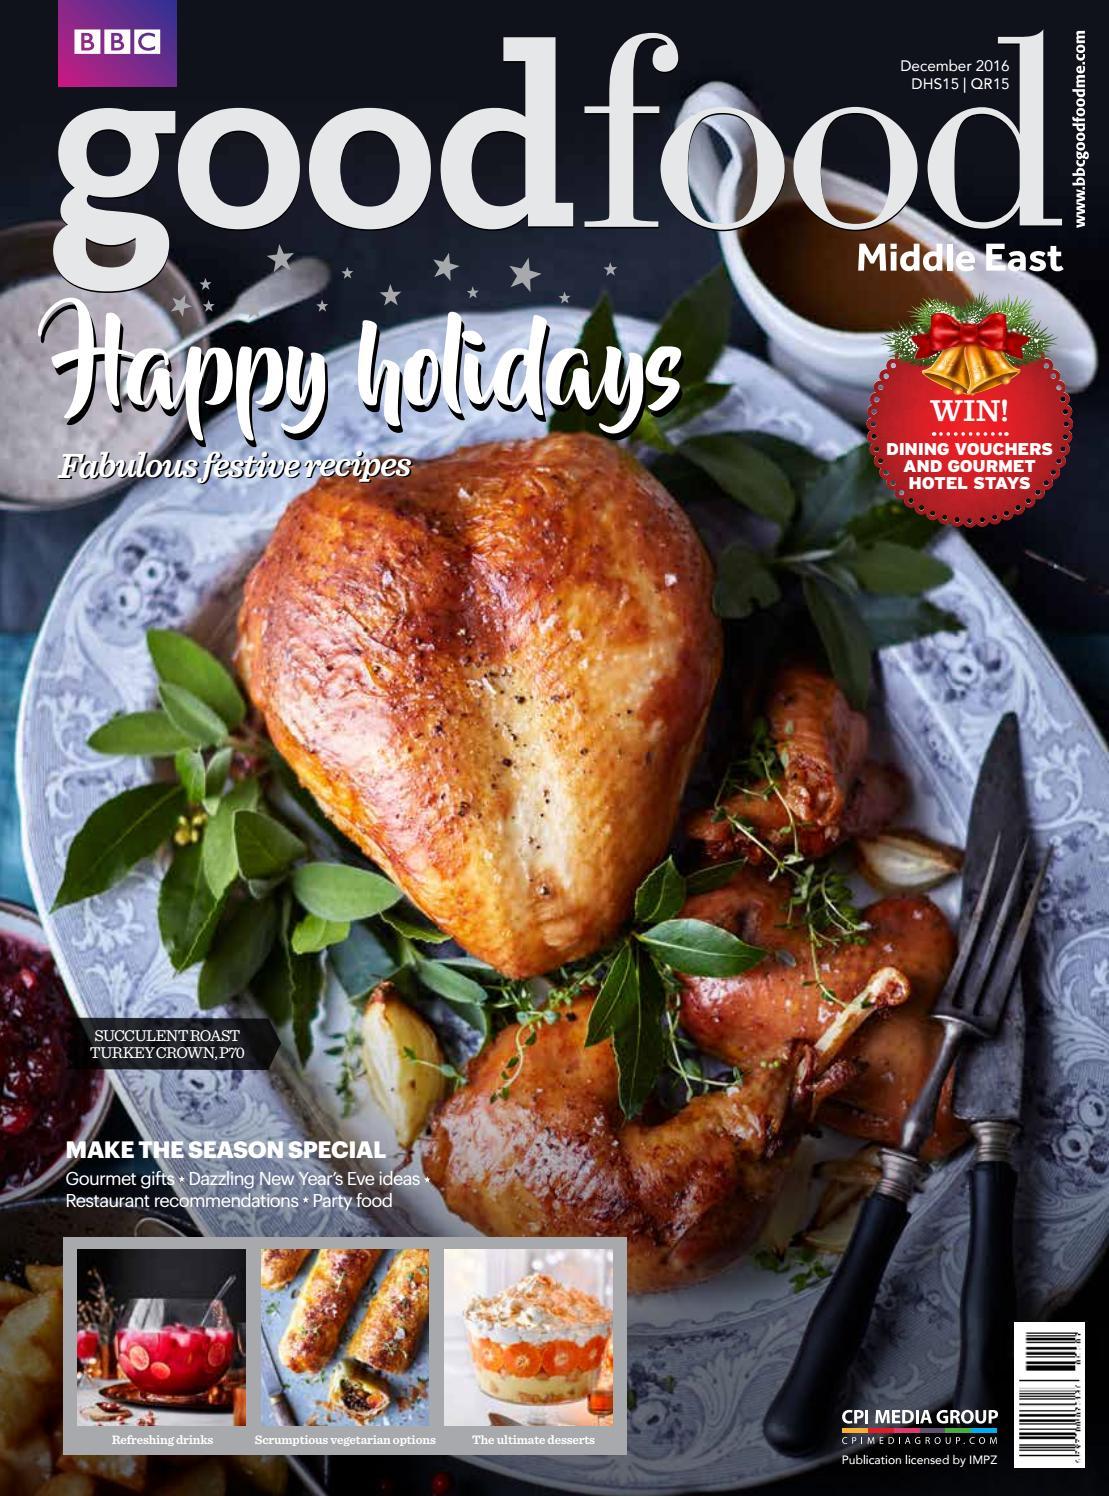 Bbc good food me 2016 december by bbc good food me issuu forumfinder Gallery